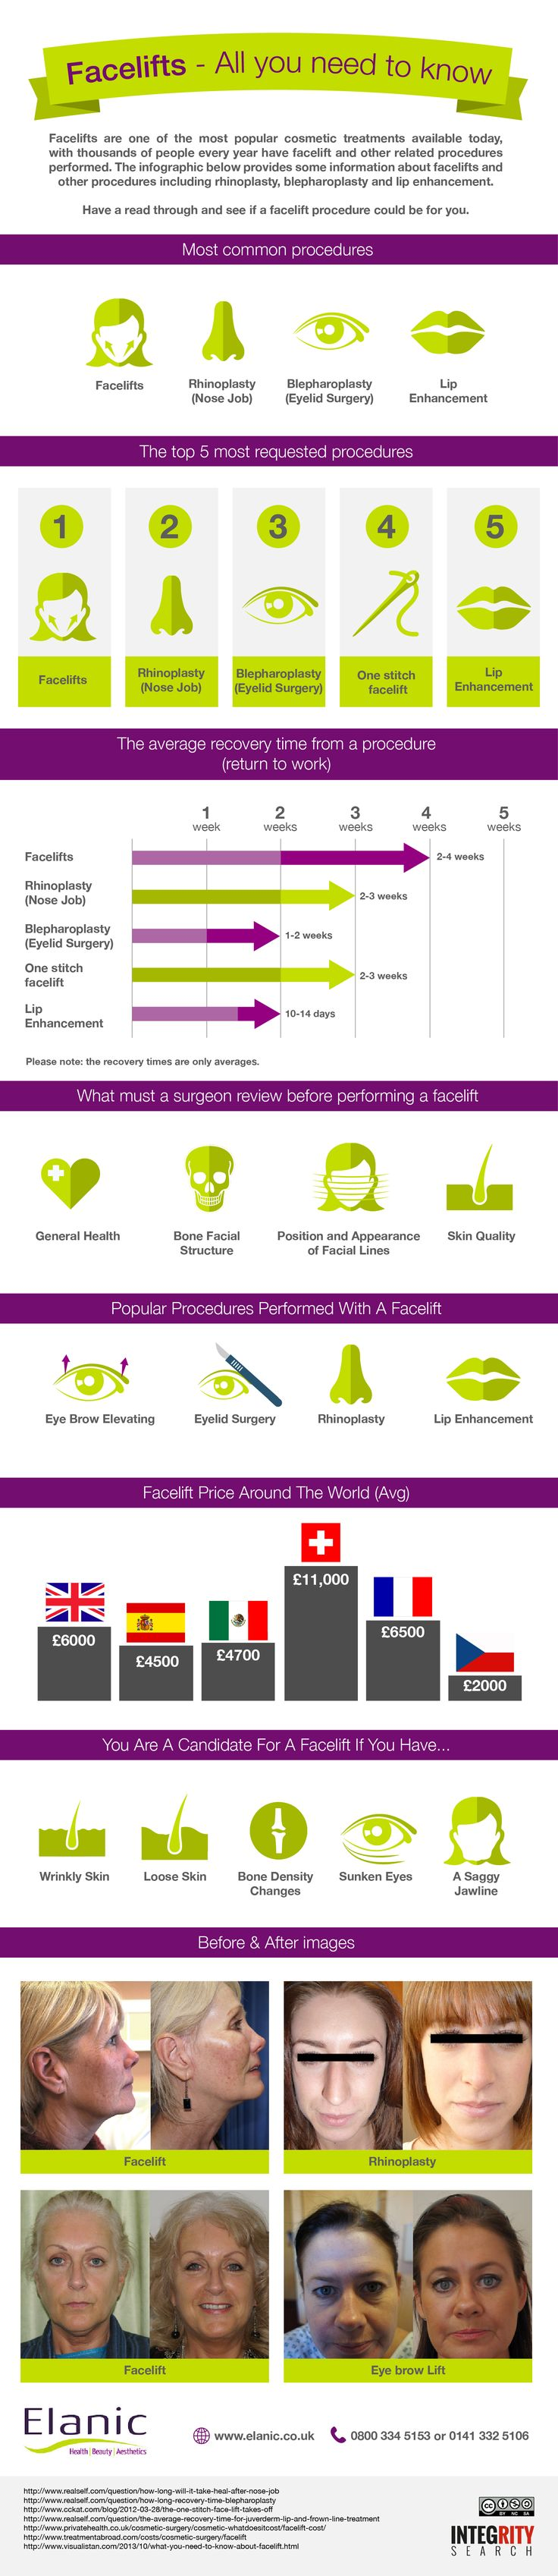 Elanic infographic jpg-01